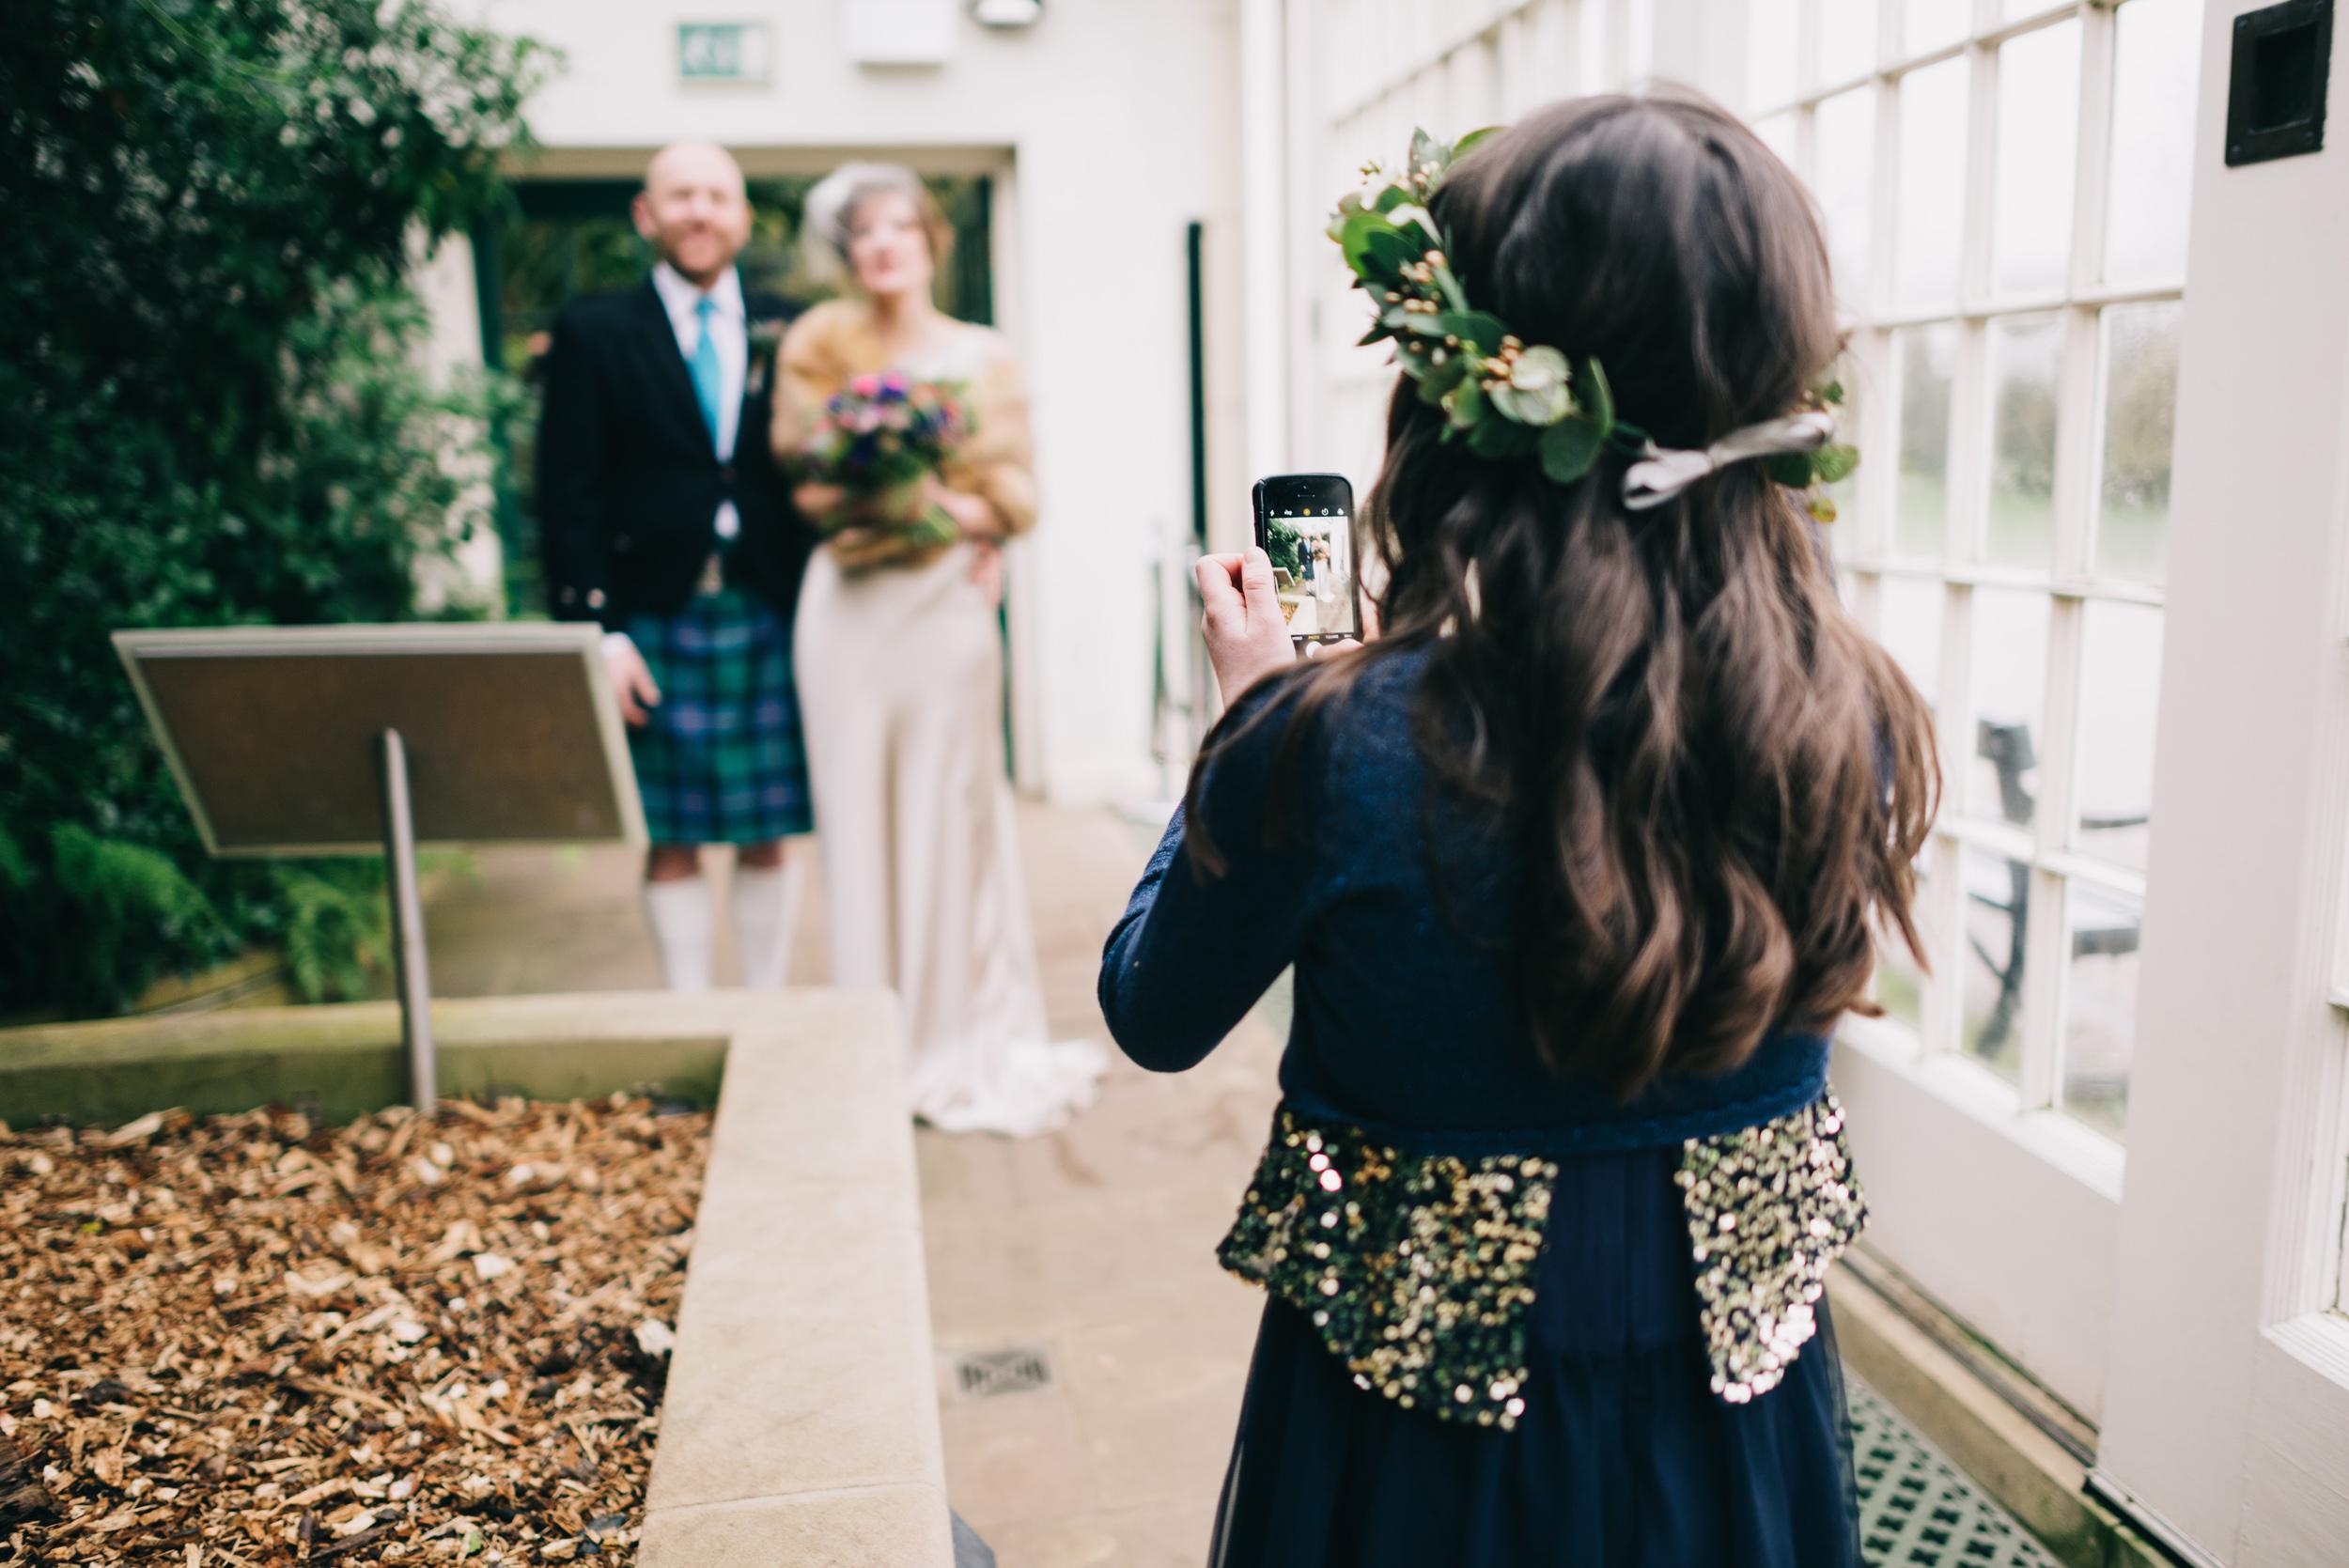 Alice-Bias-Cut-Silk-Wedding-Dress-Kate-Beaumont-Sheffield-Botanical-Gardens-by-Peakography-15.jpg